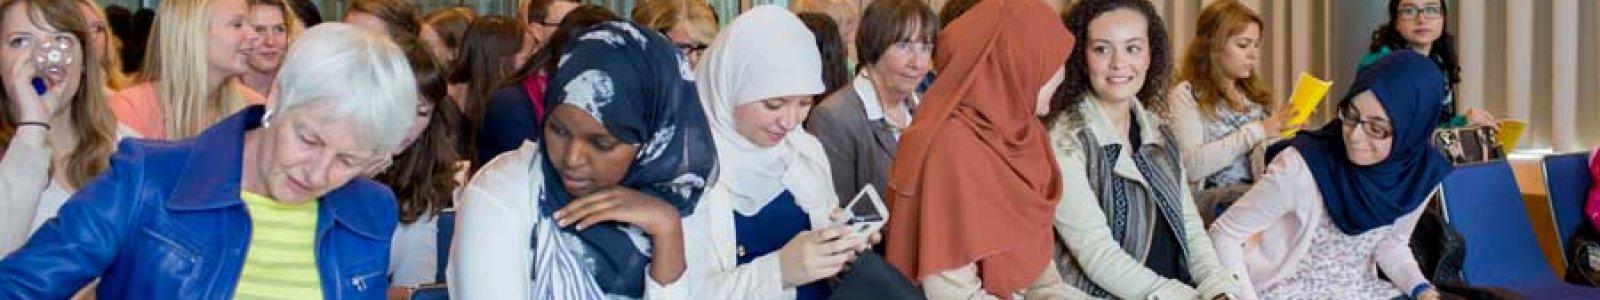 Westerdijk fellowship, diversity, gender